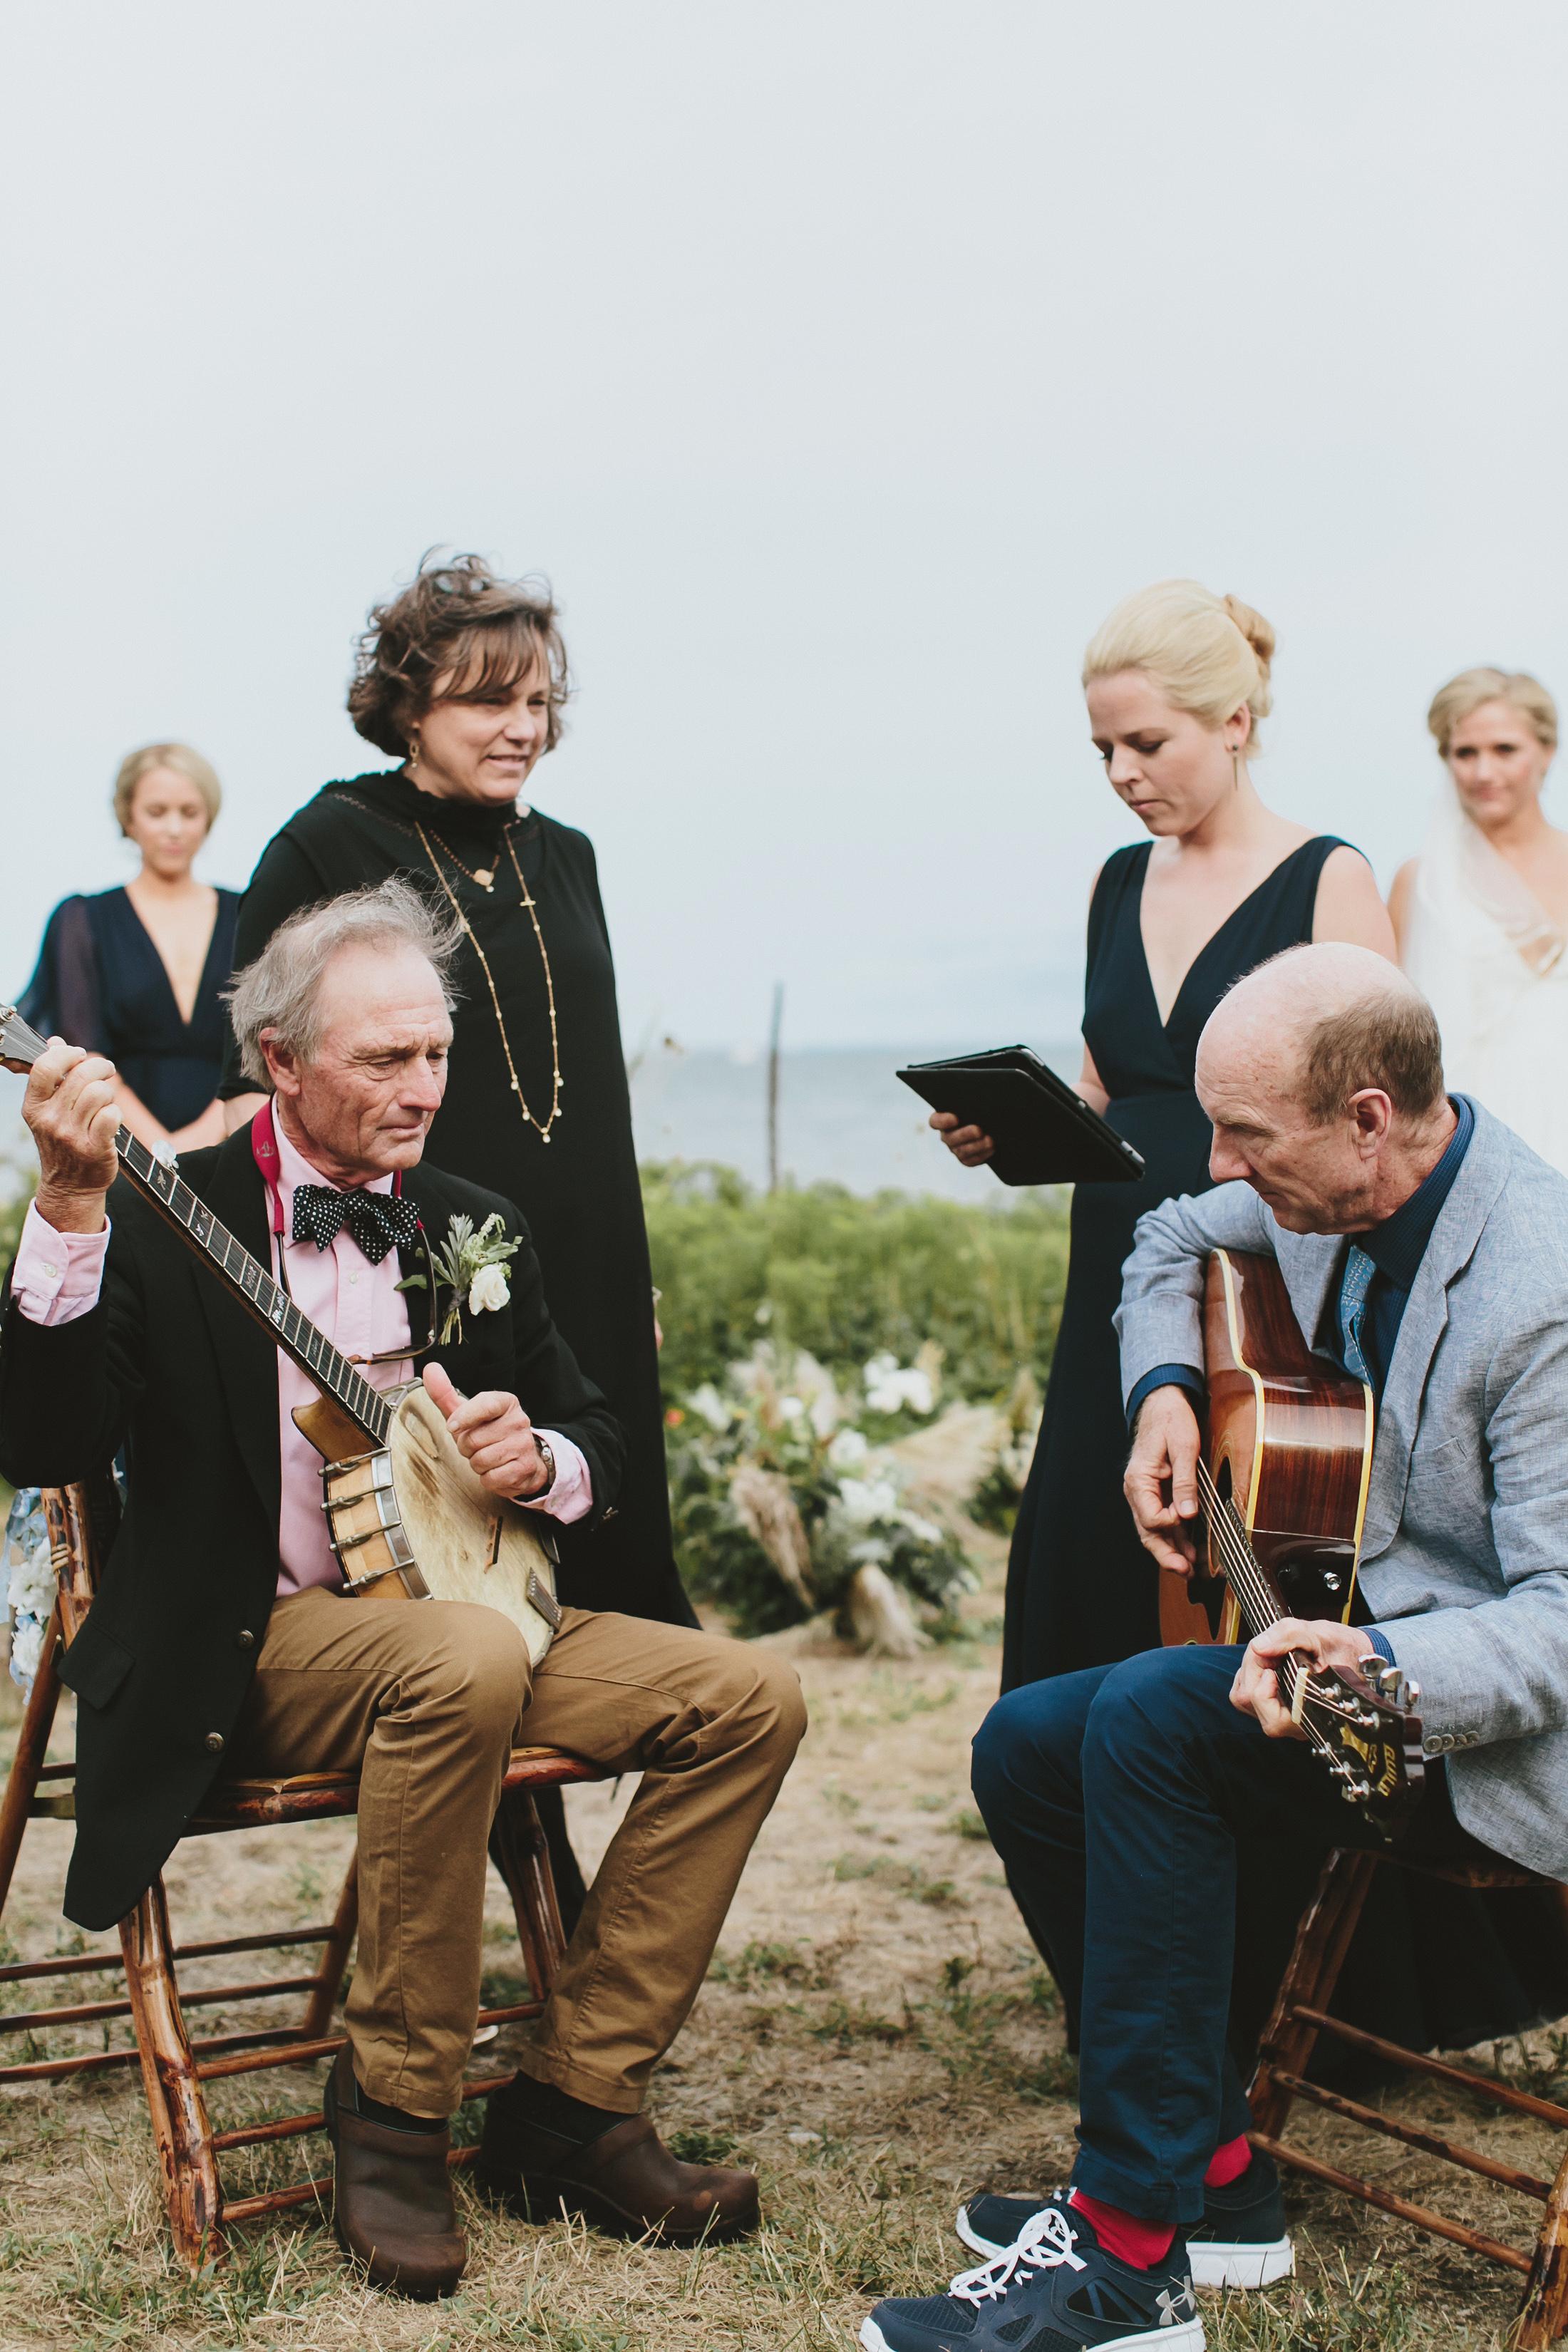 hadley corey wedding musicians